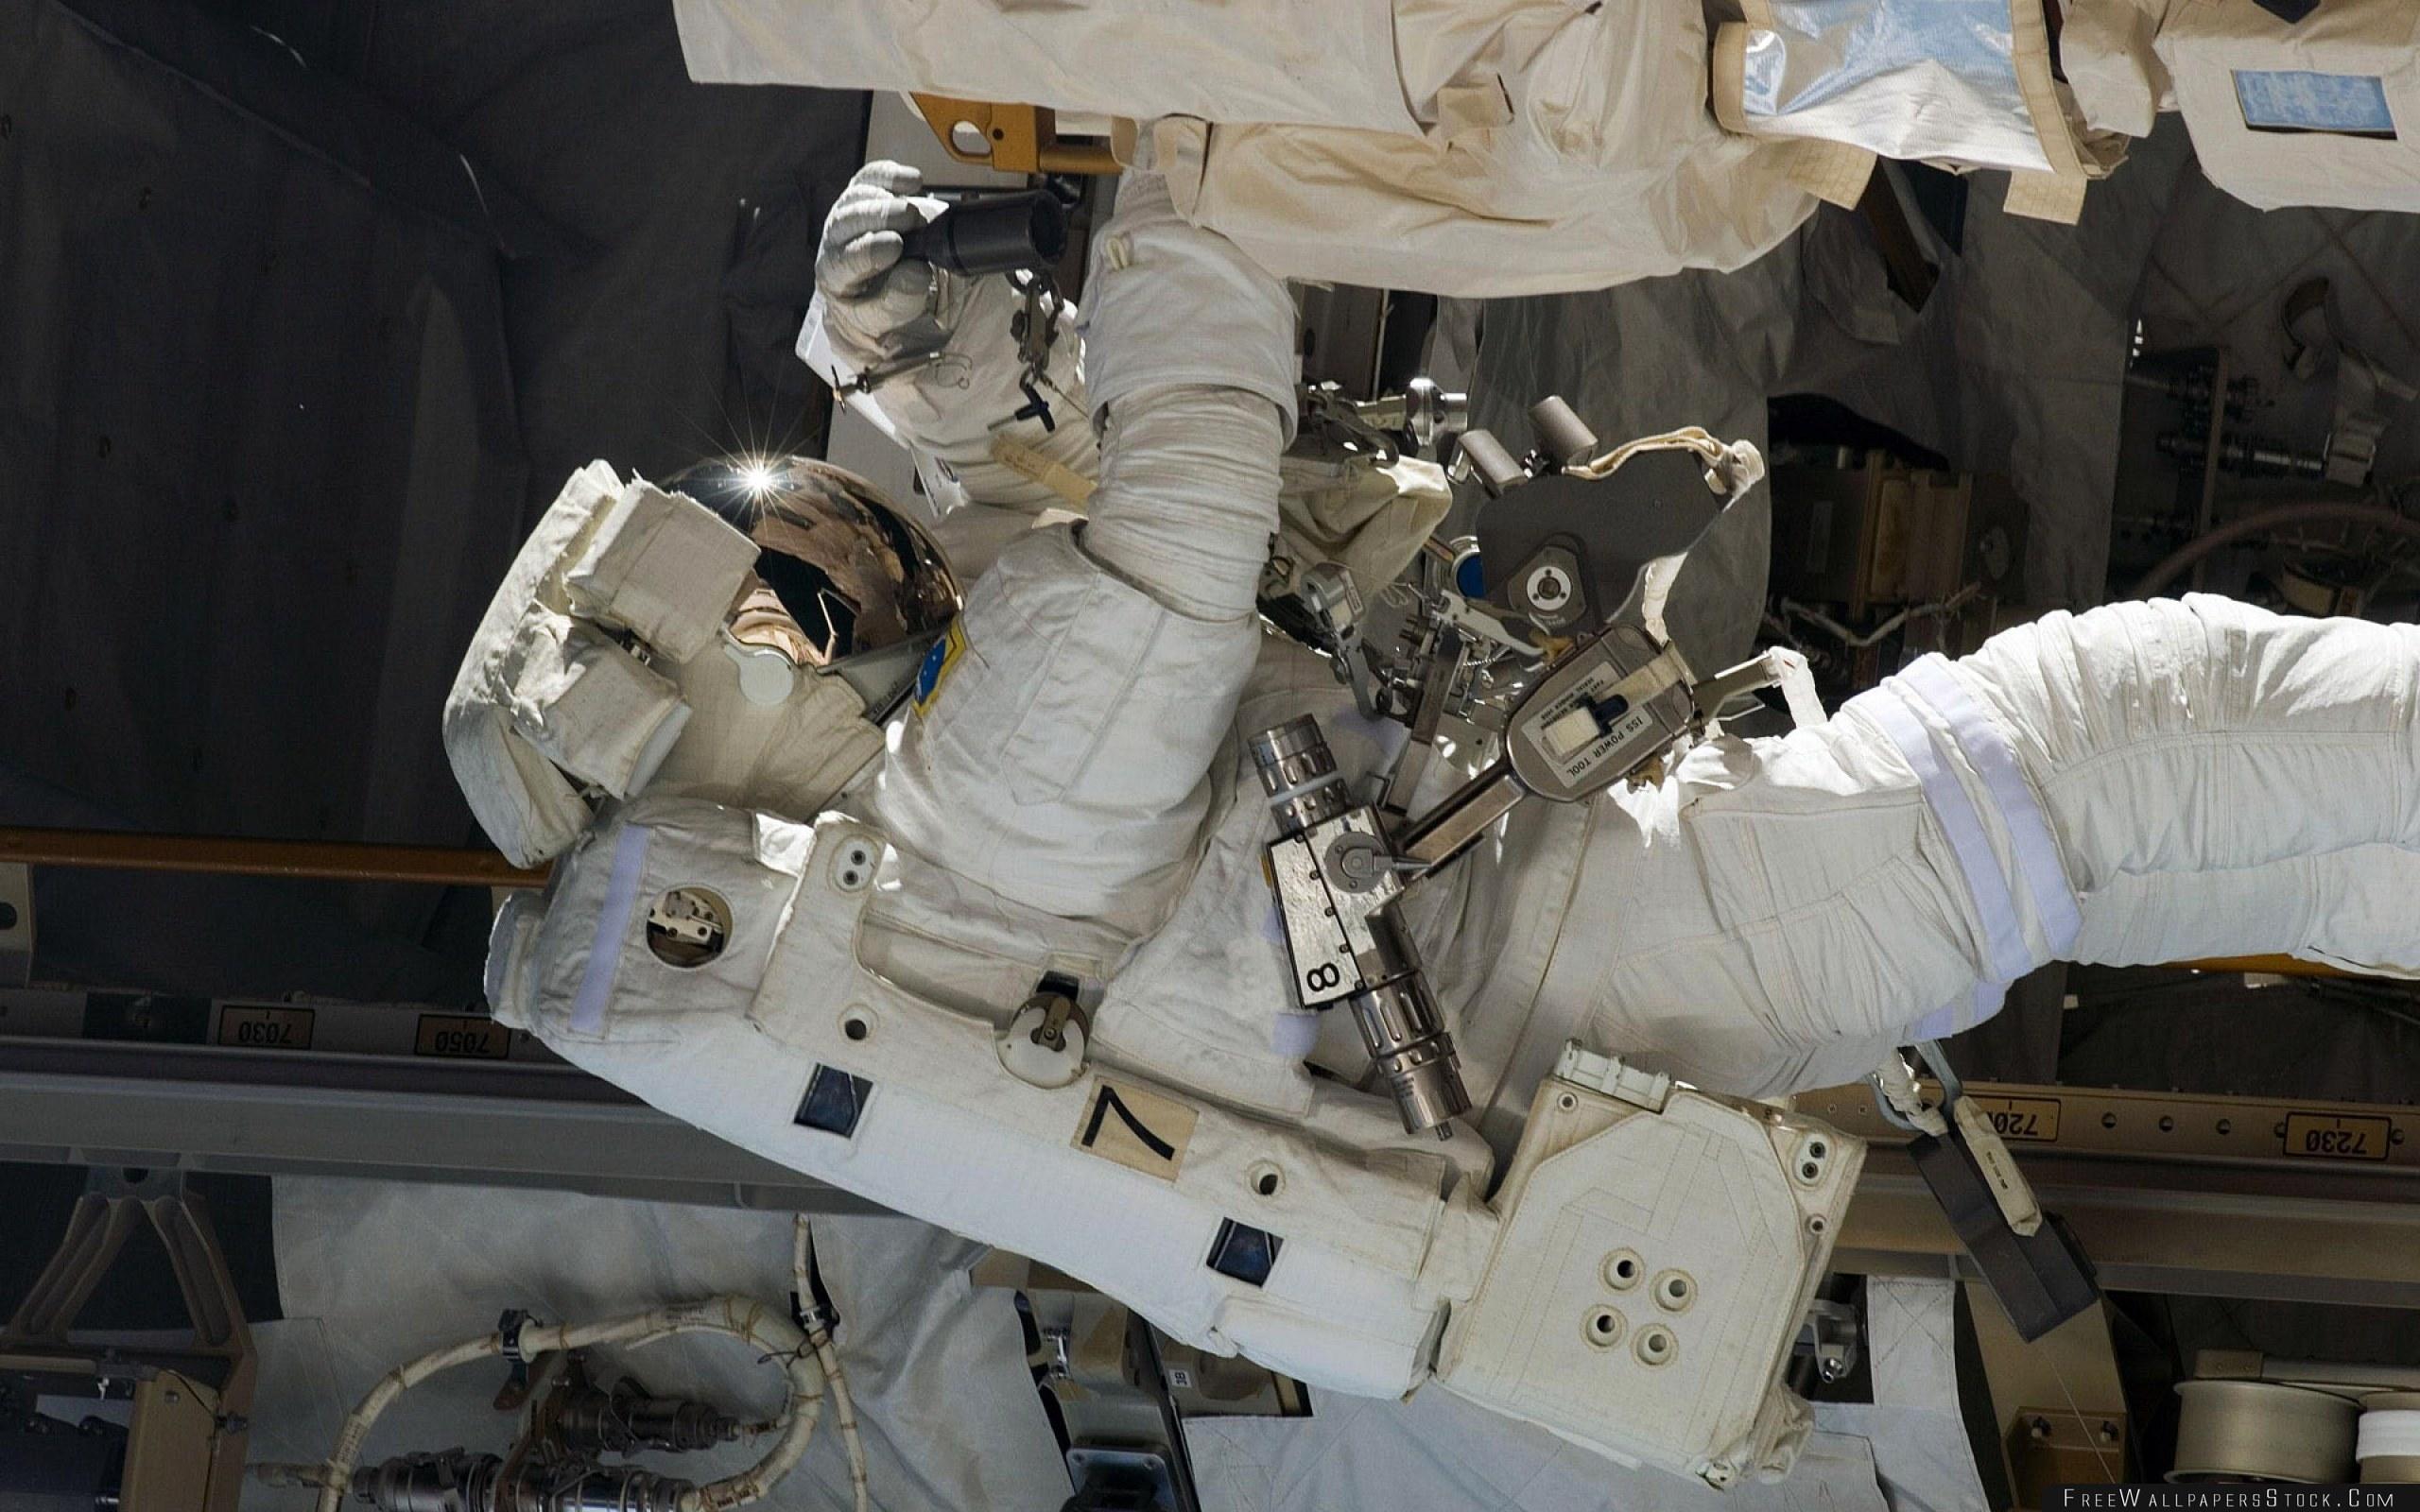 Download Free Wallpaper Cosmonaut Survival Suit Ship Case Repair Equipment